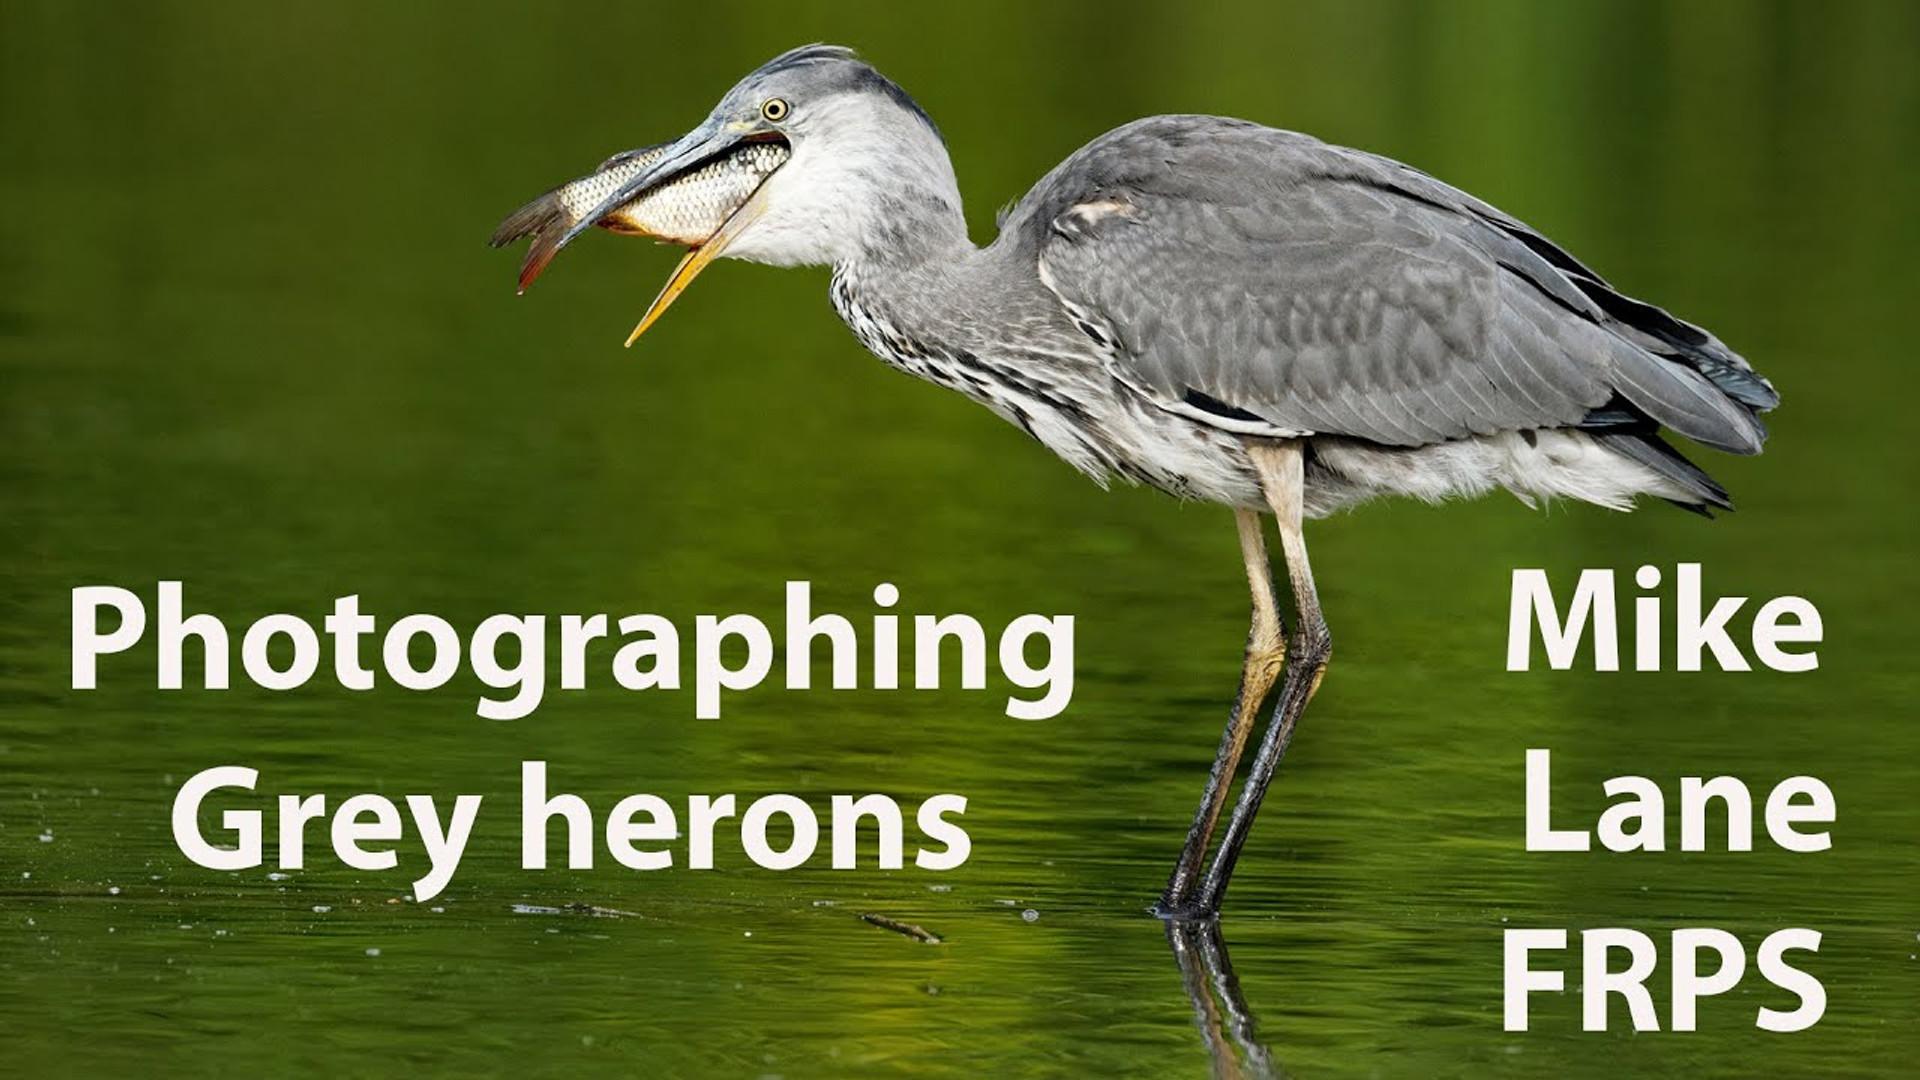 Photographing Grey herons